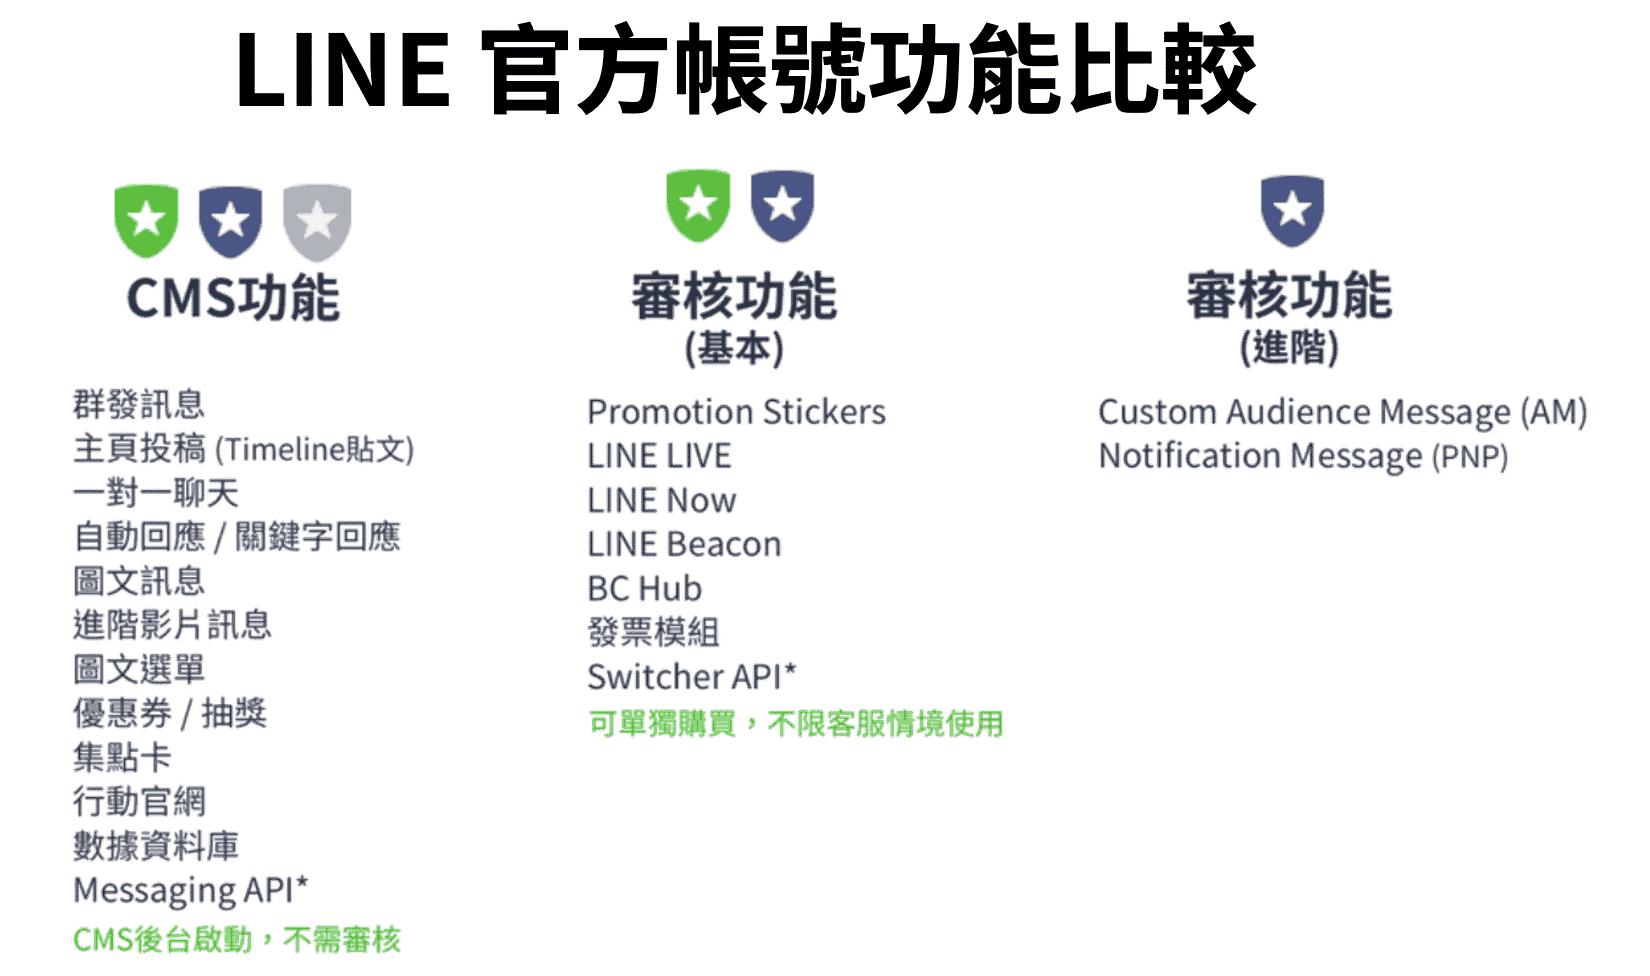 line 官方帳號功能比較